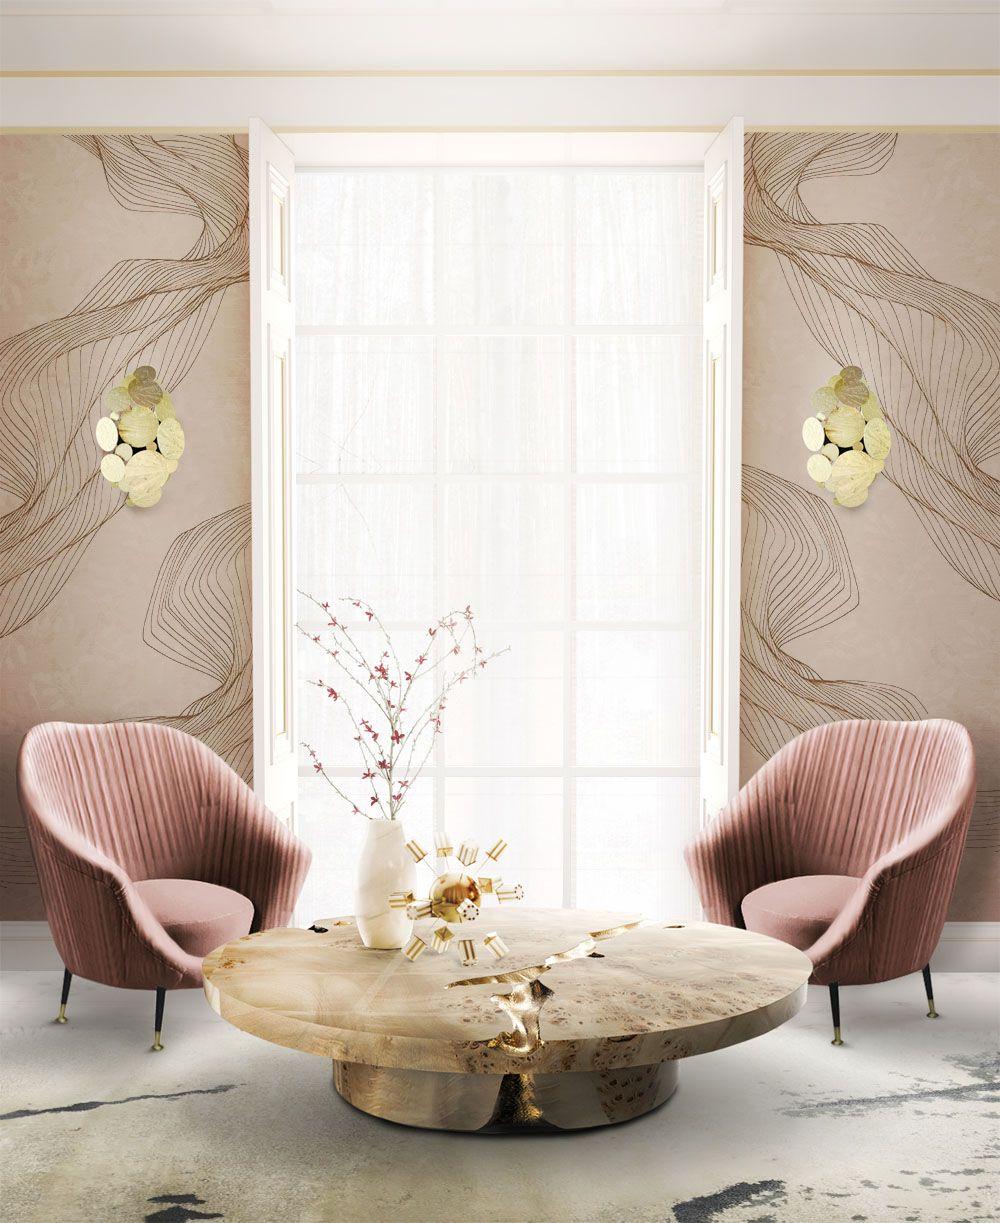 Pin By Anissa El On Modern Affair Home Fall 18 19 P G Feminine Living Room Luxury Living Room Interior Design [ 1223 x 1000 Pixel ]